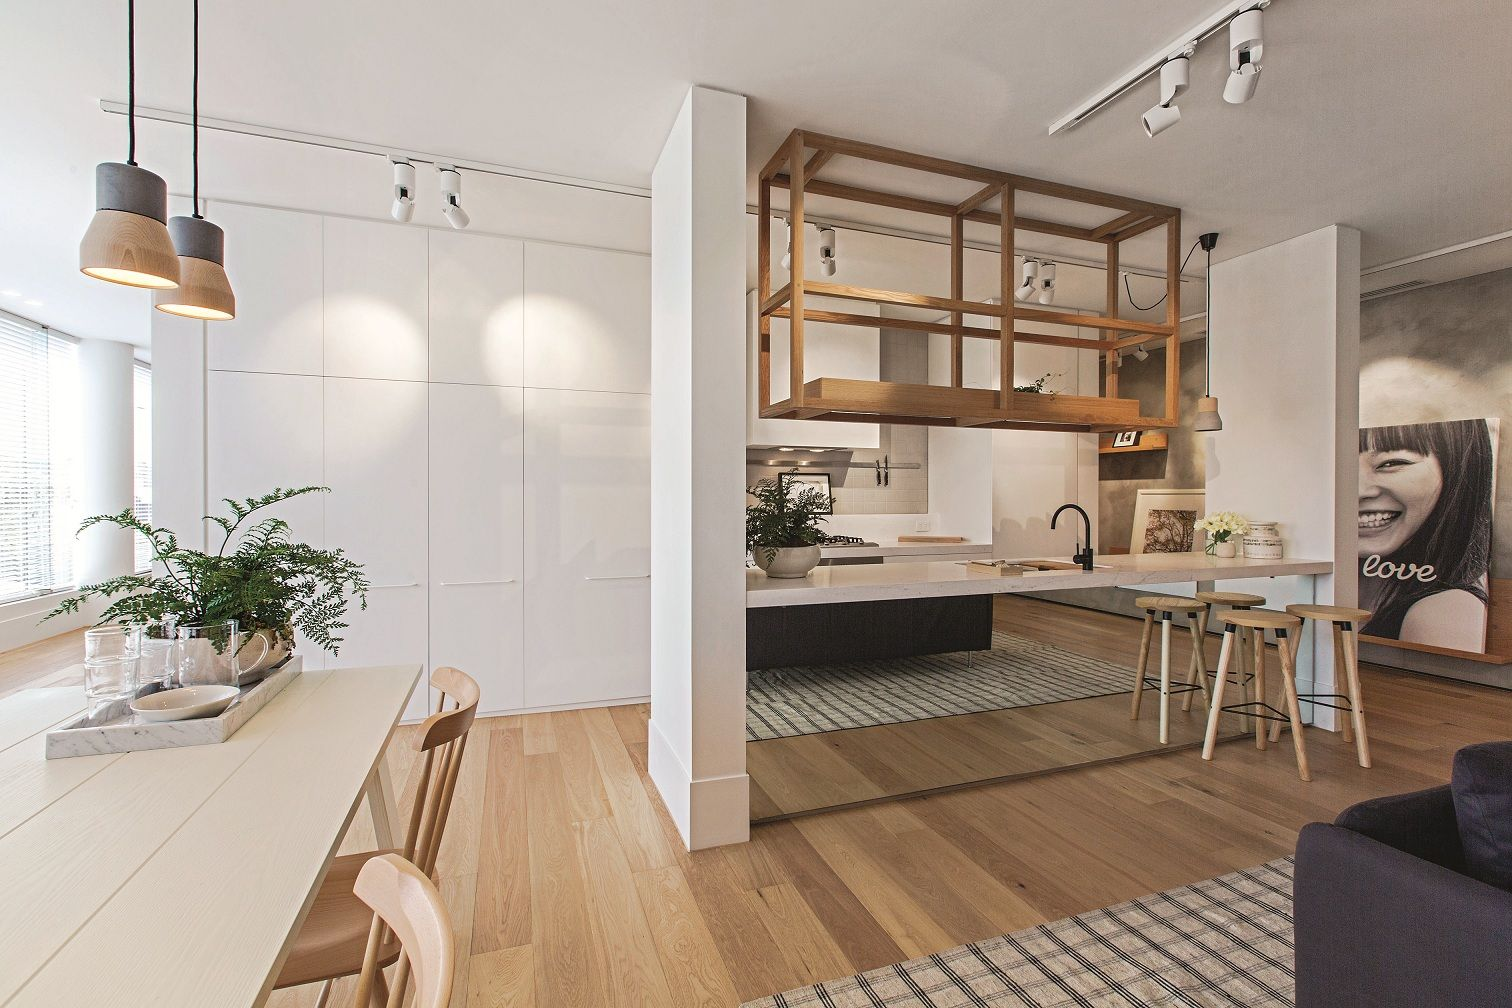 Leo apartments melbourne is design hecker guthrie for Apartment design melbourne